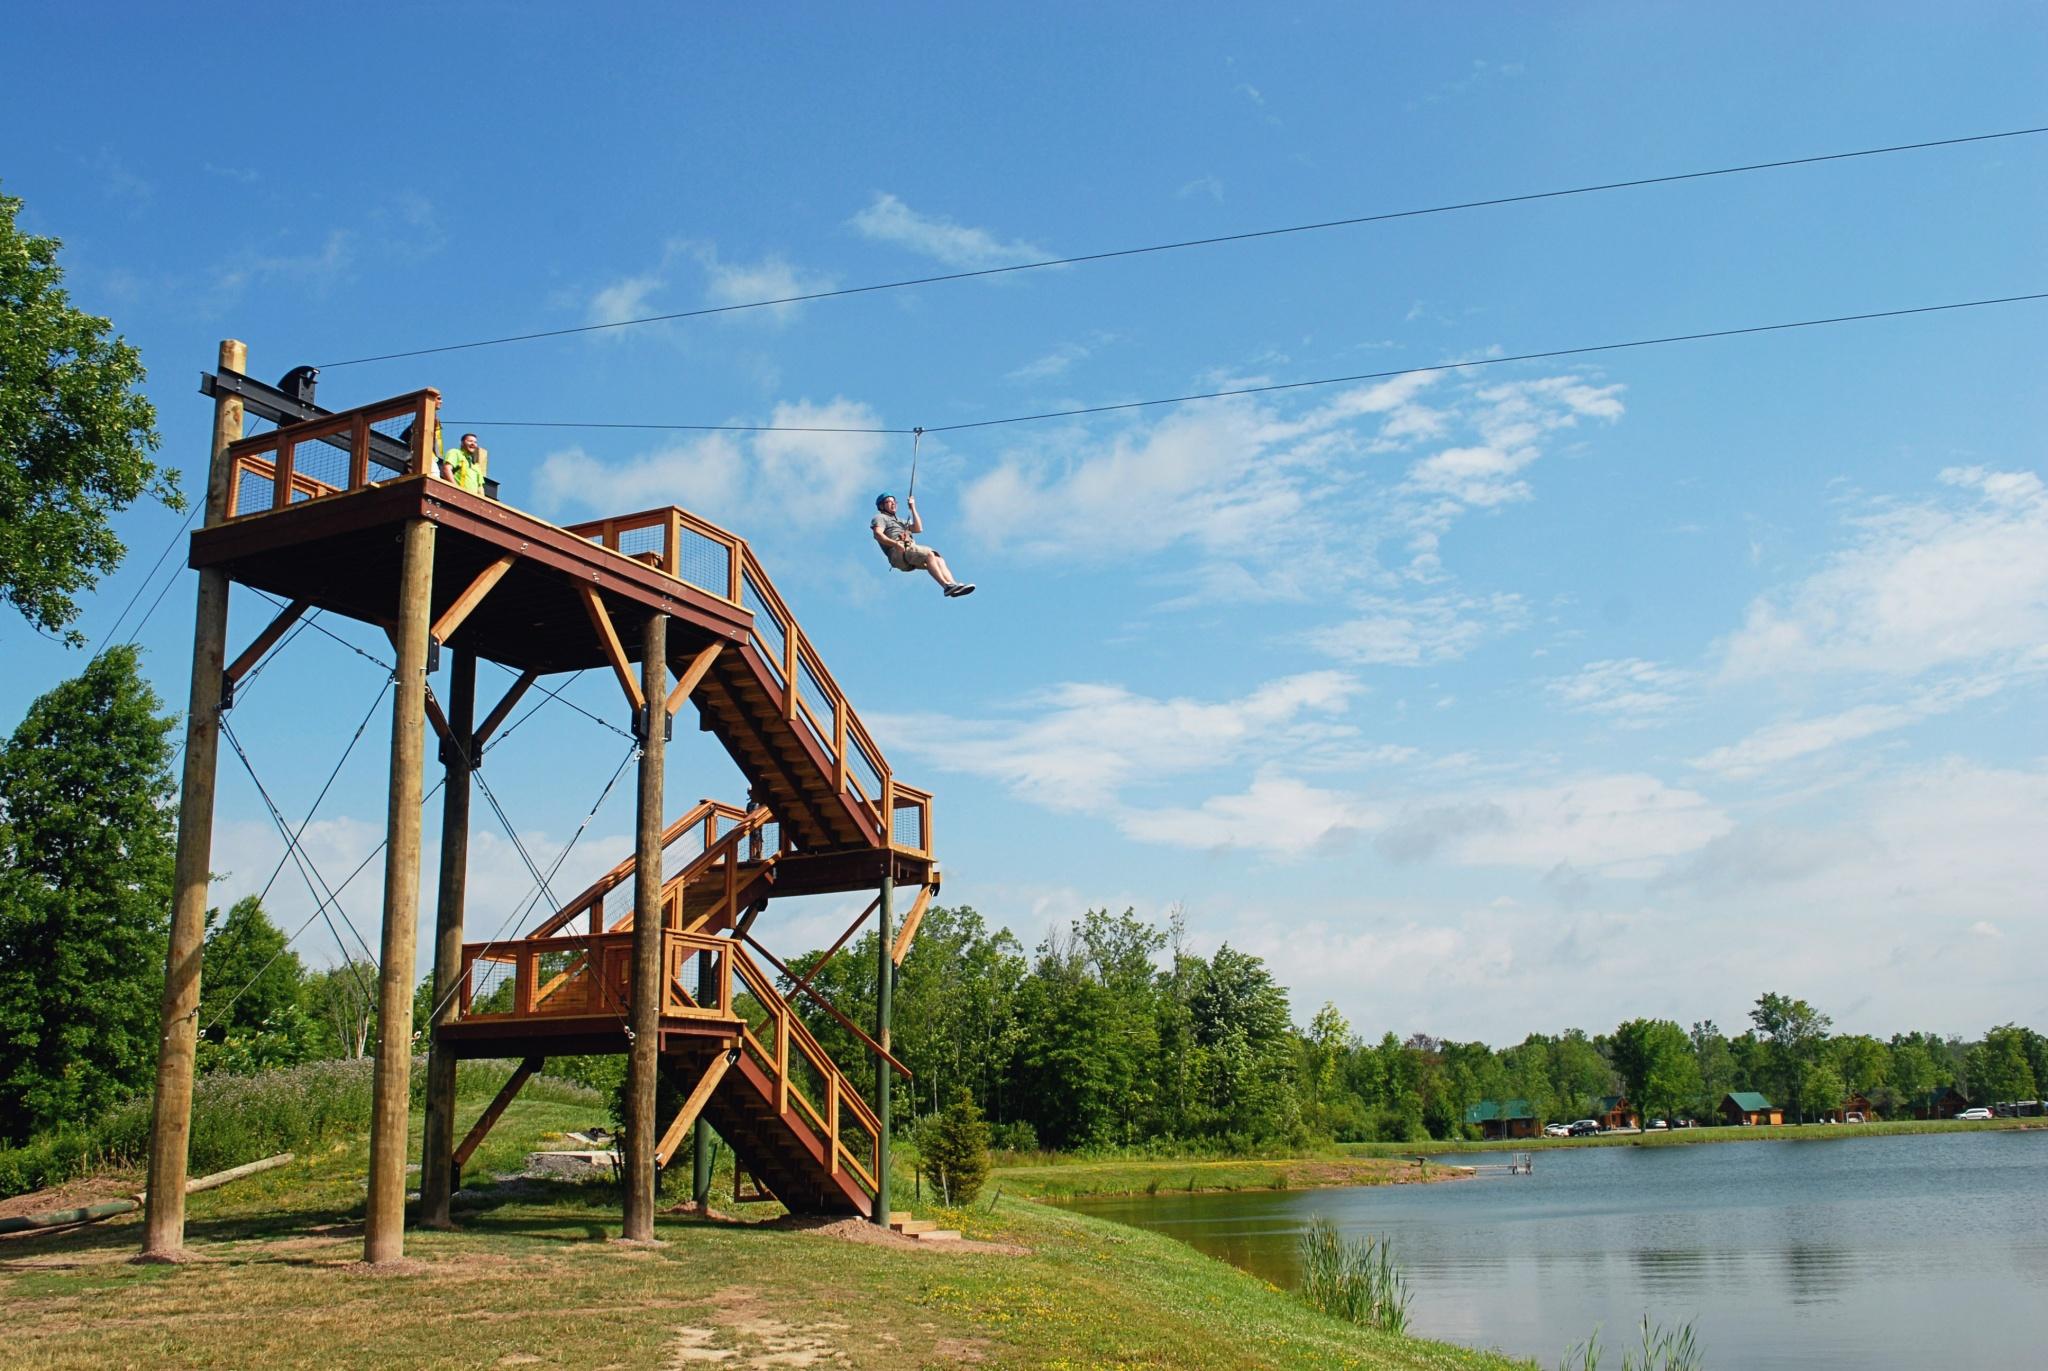 Zipline going over a river